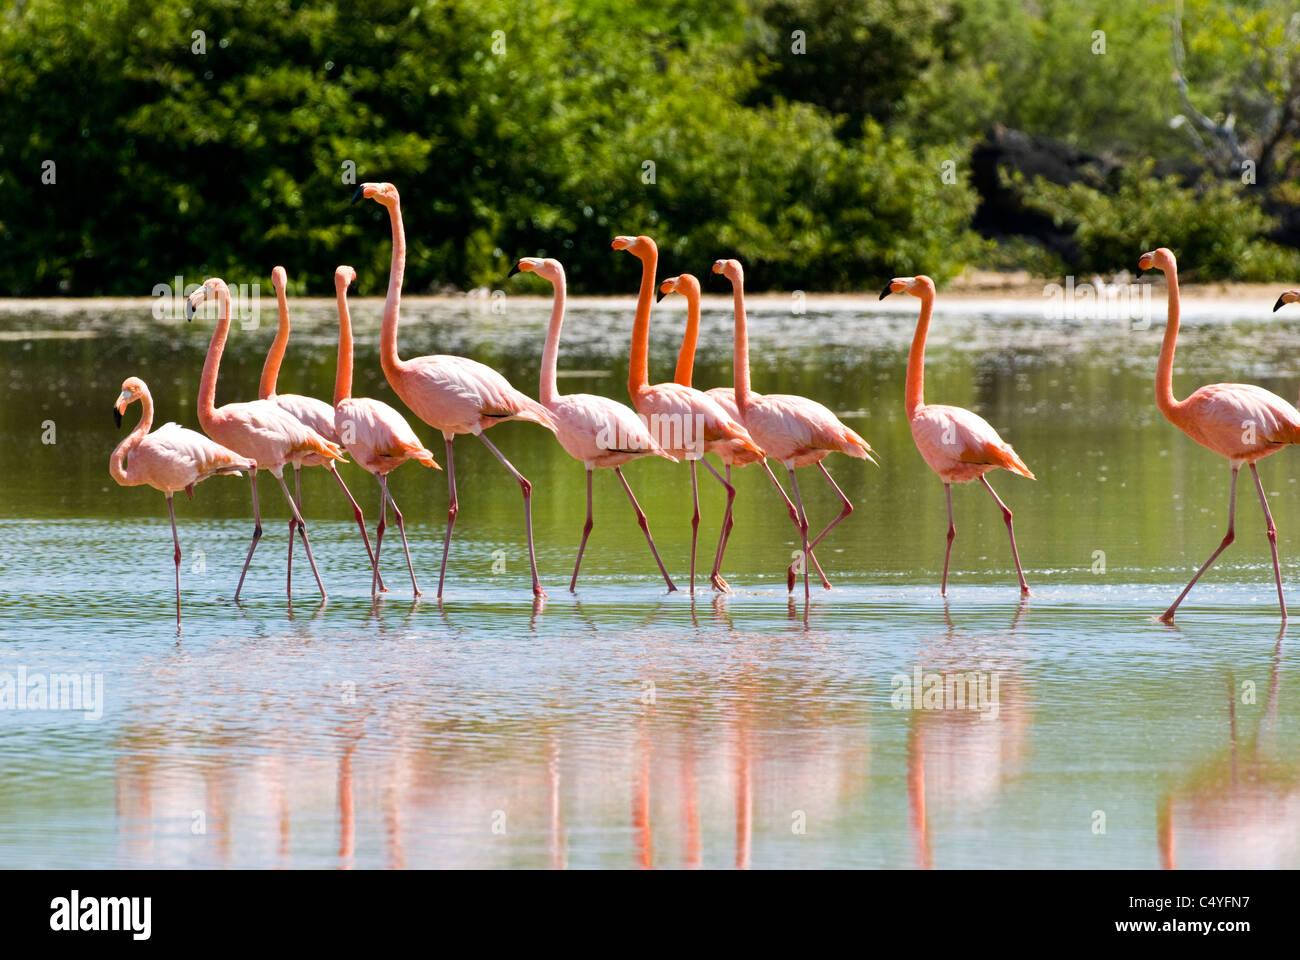 Greater flamingos in lagoon on Floreana Island in the Galapagos Islands Ecuador - Stock Image